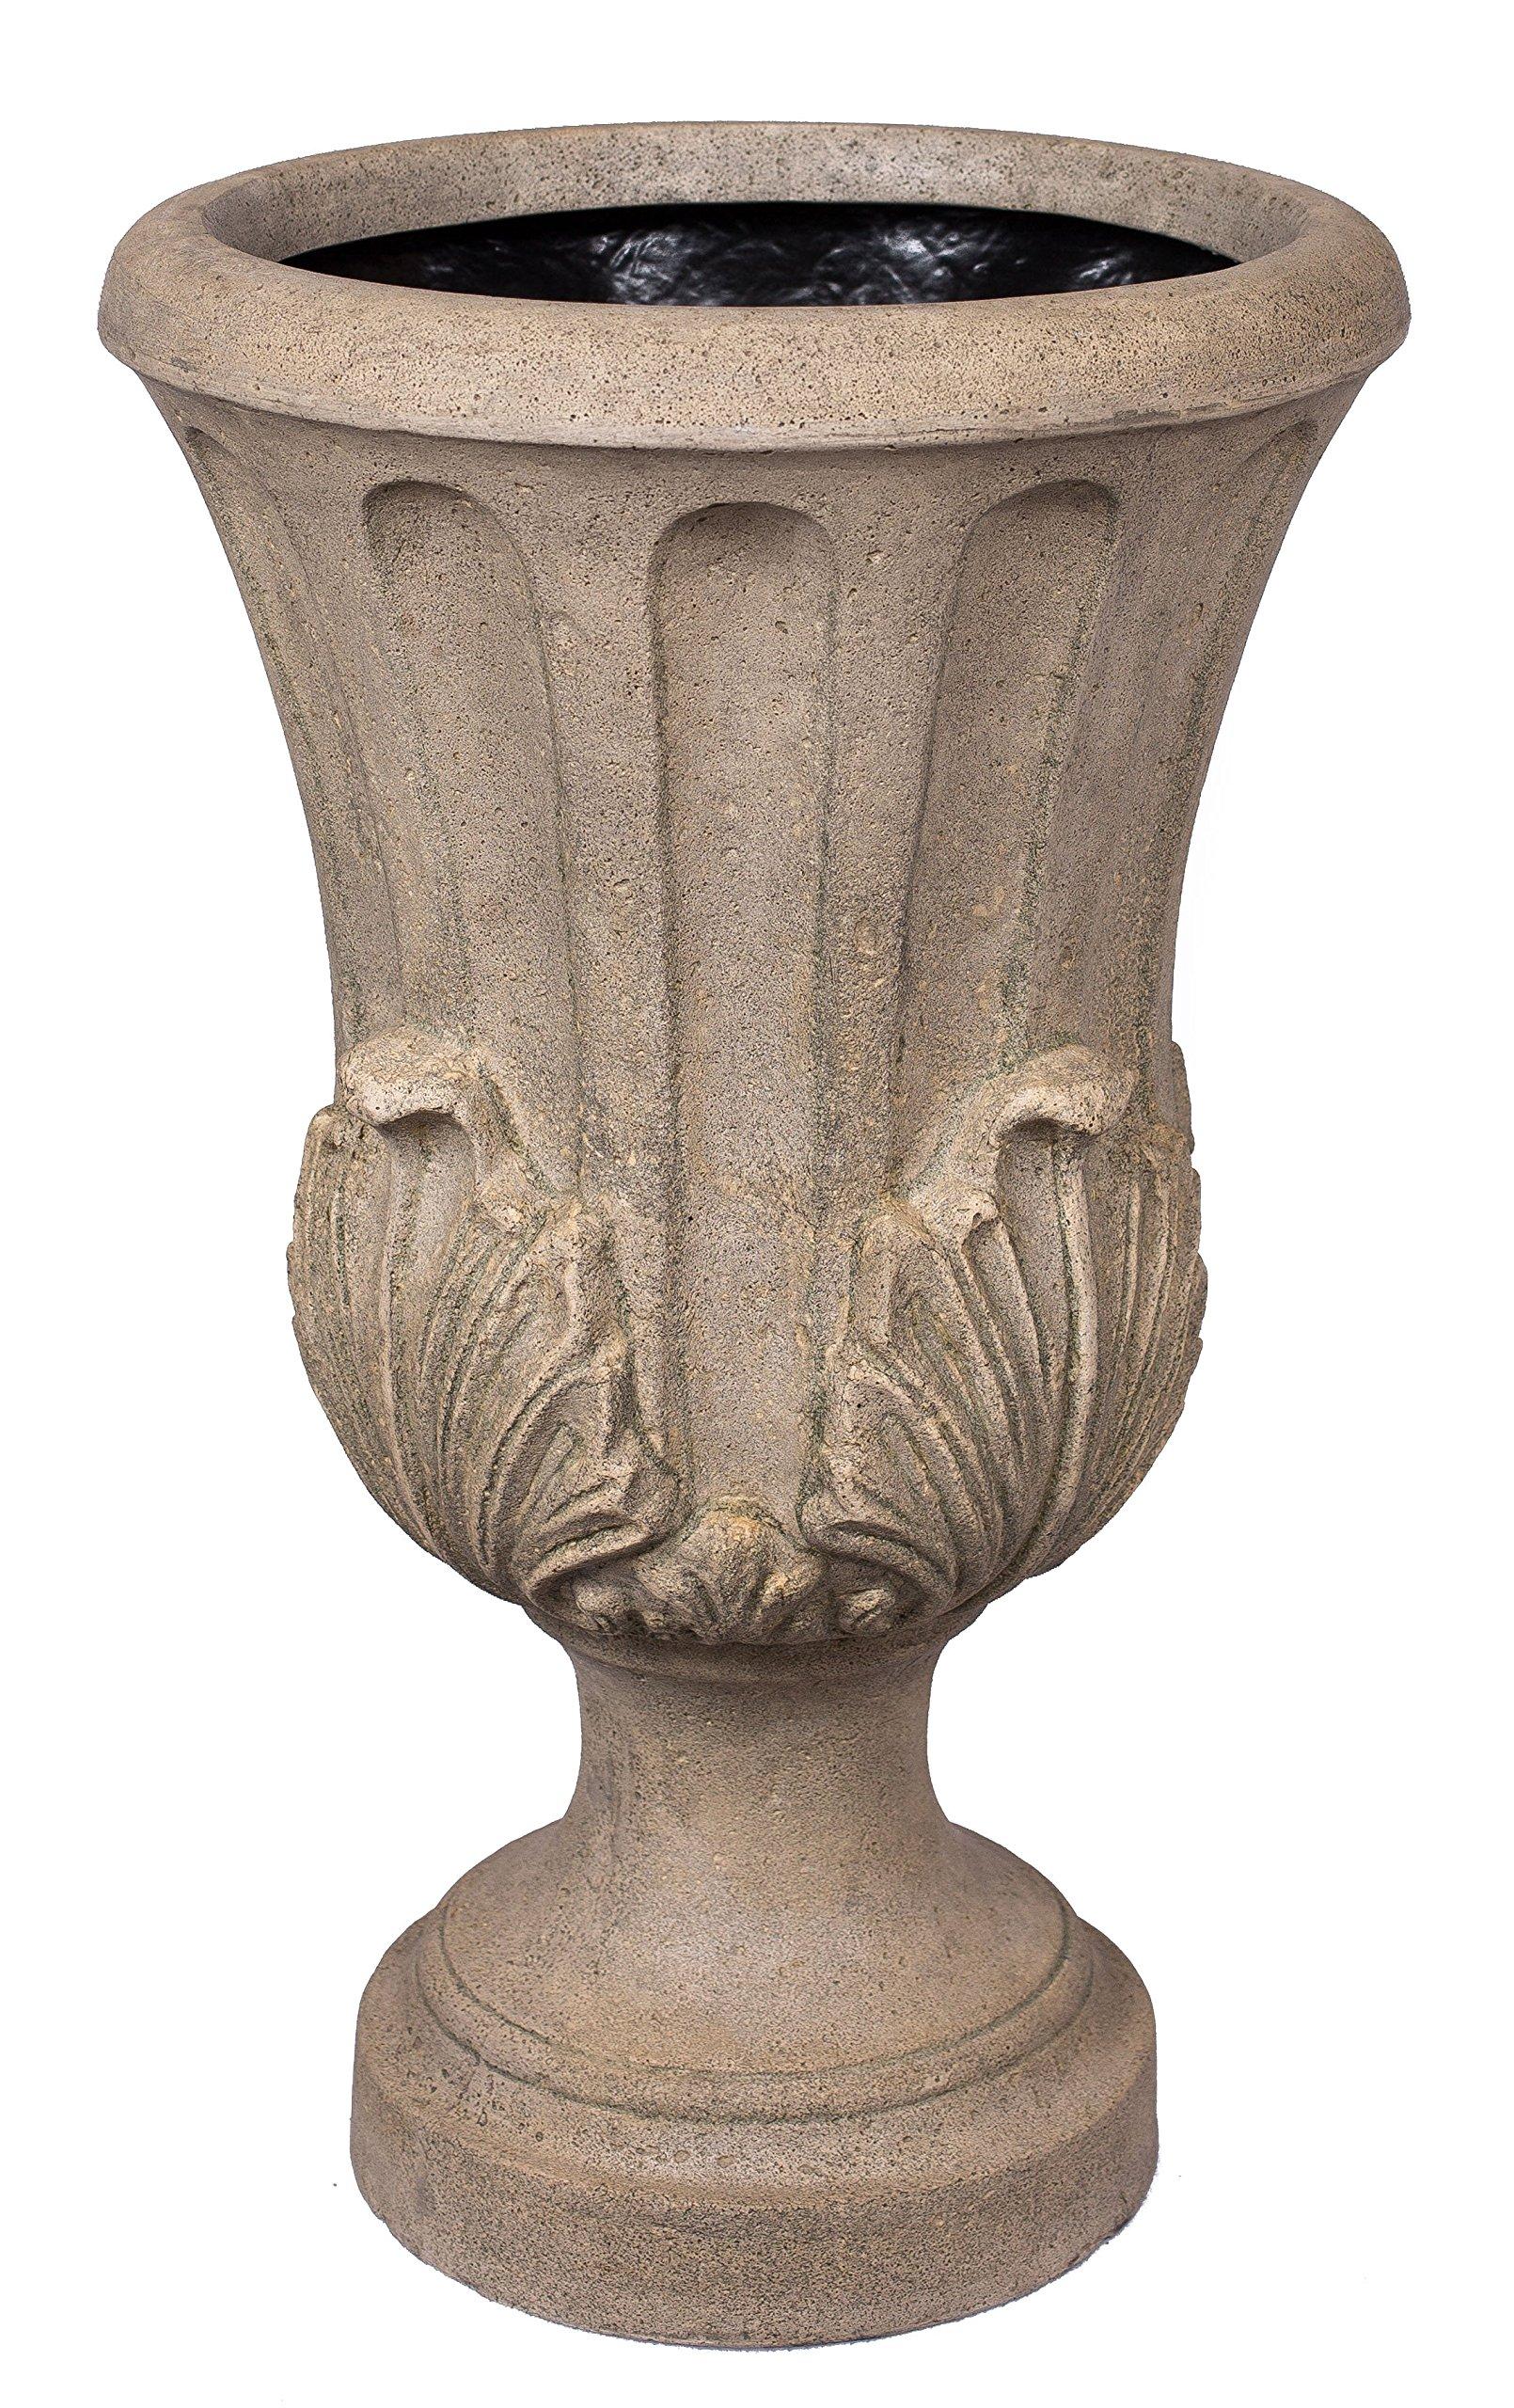 BirdRock Garden Roman Acanthus Urn - Aged Granite | Indoor Outdoor Planter Urn by BirdRock Home